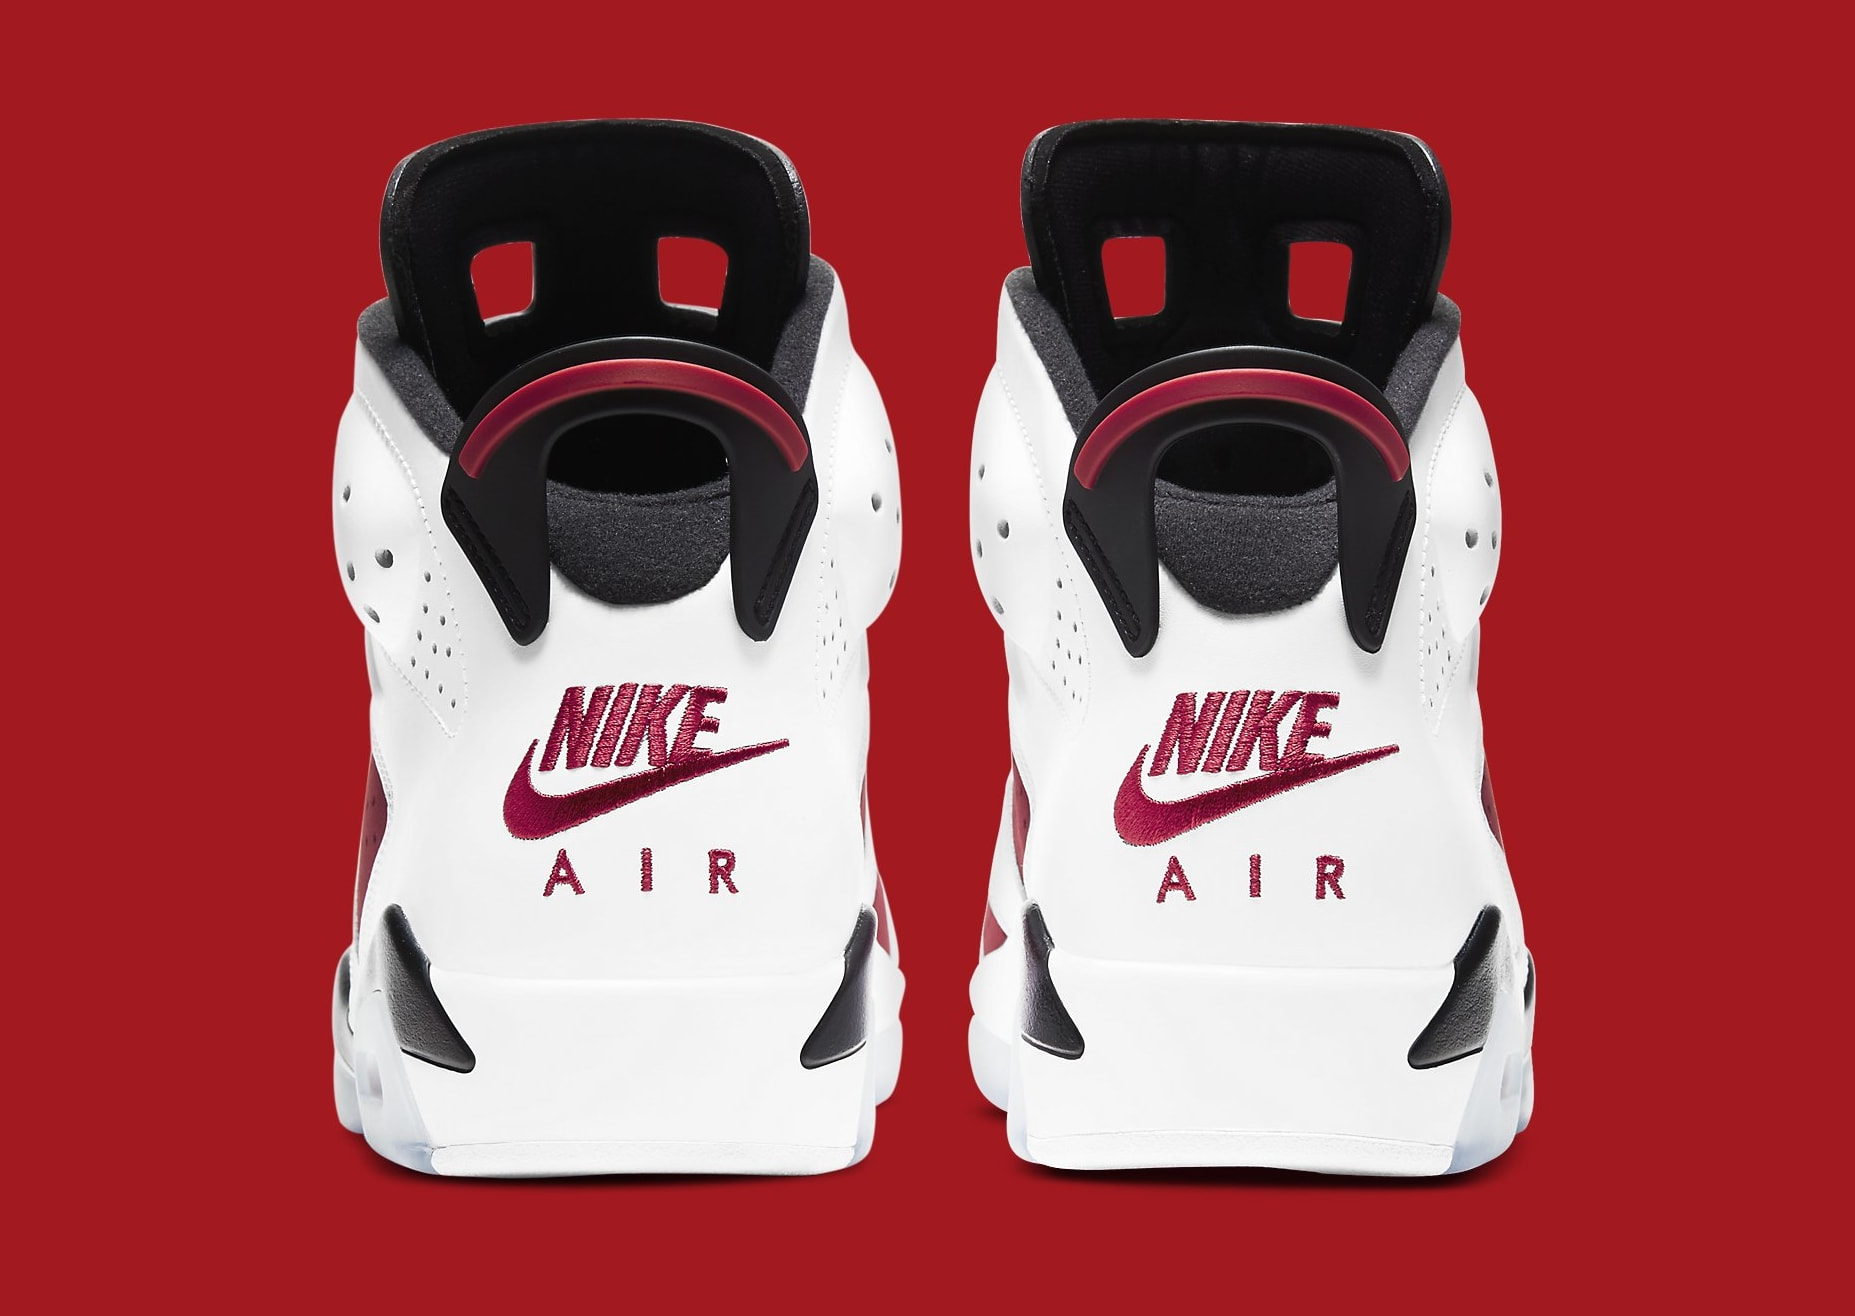 Air Jordan 6 Retro 'Carmine' 2021 CT8529-106 Heel